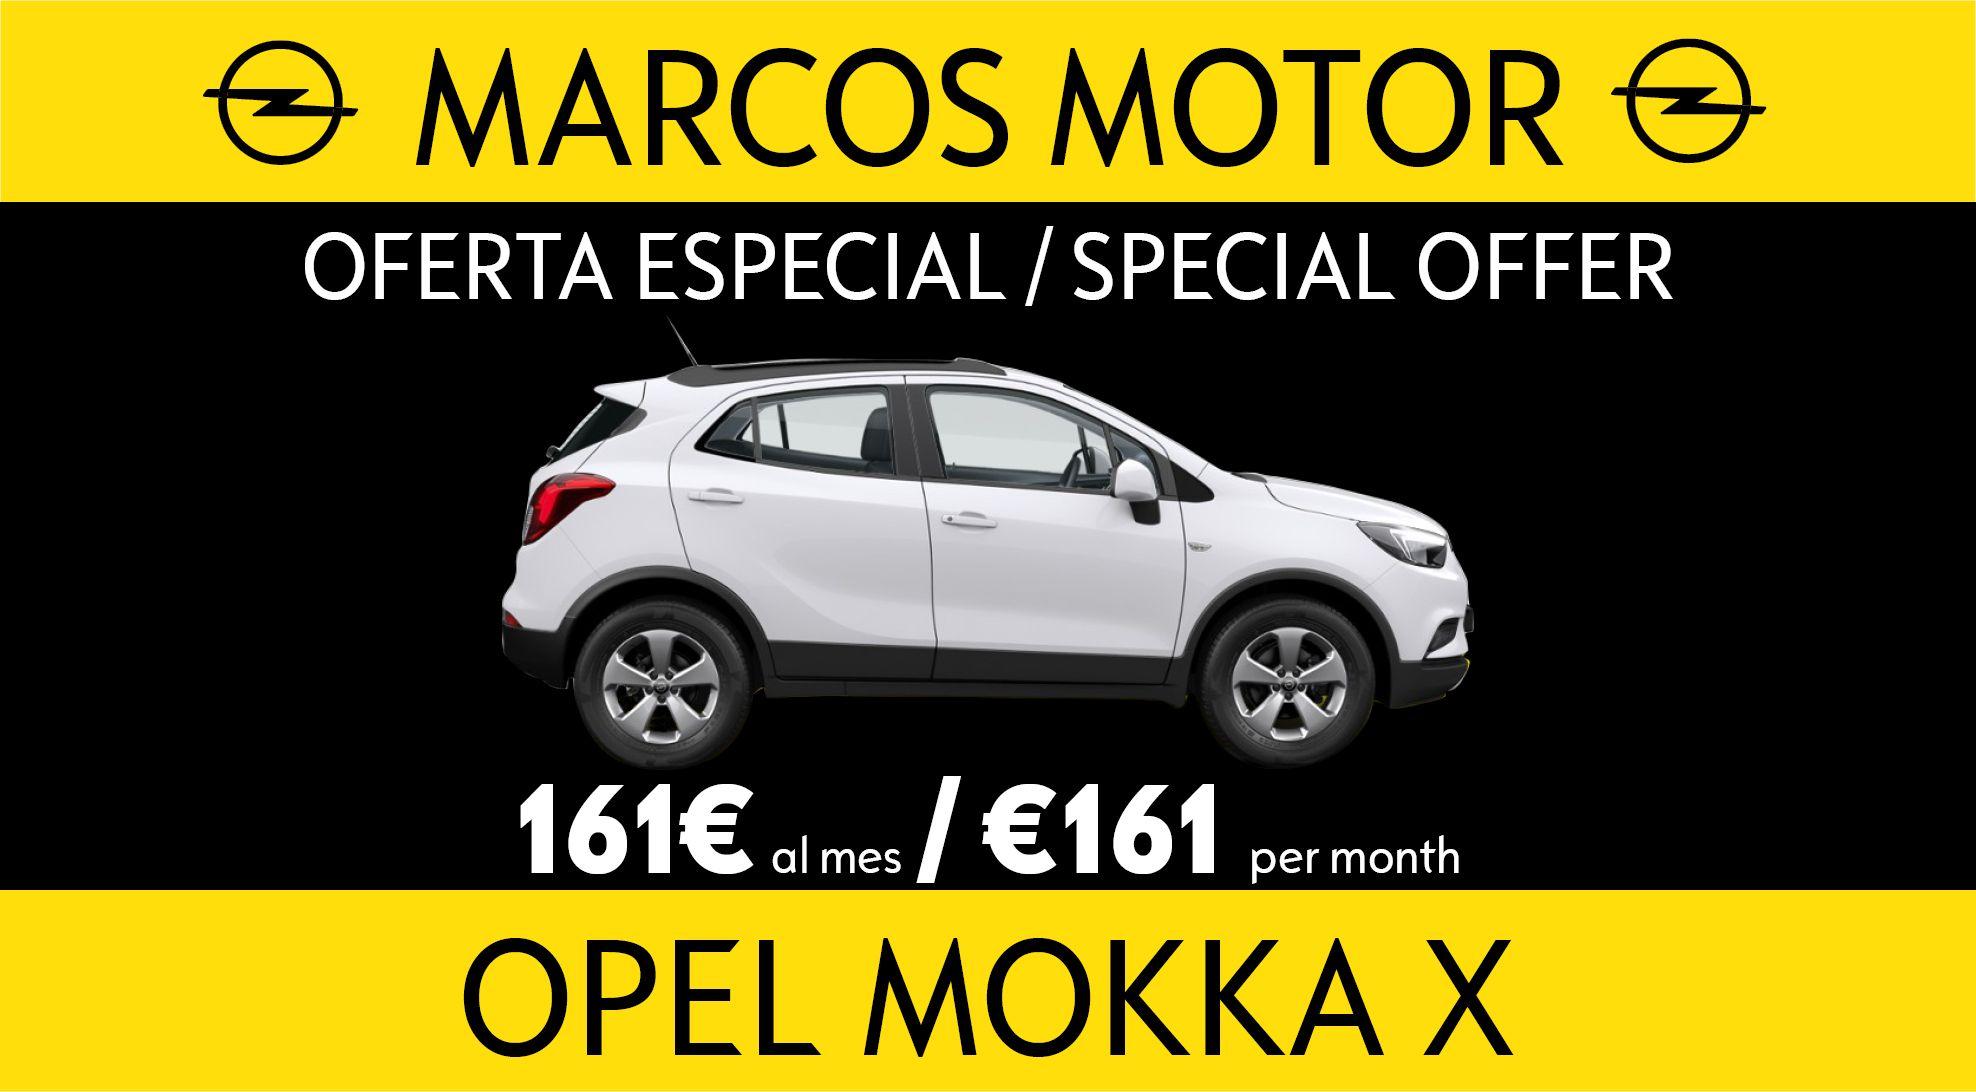 Oferta Opel Mokka X 161€ al mes